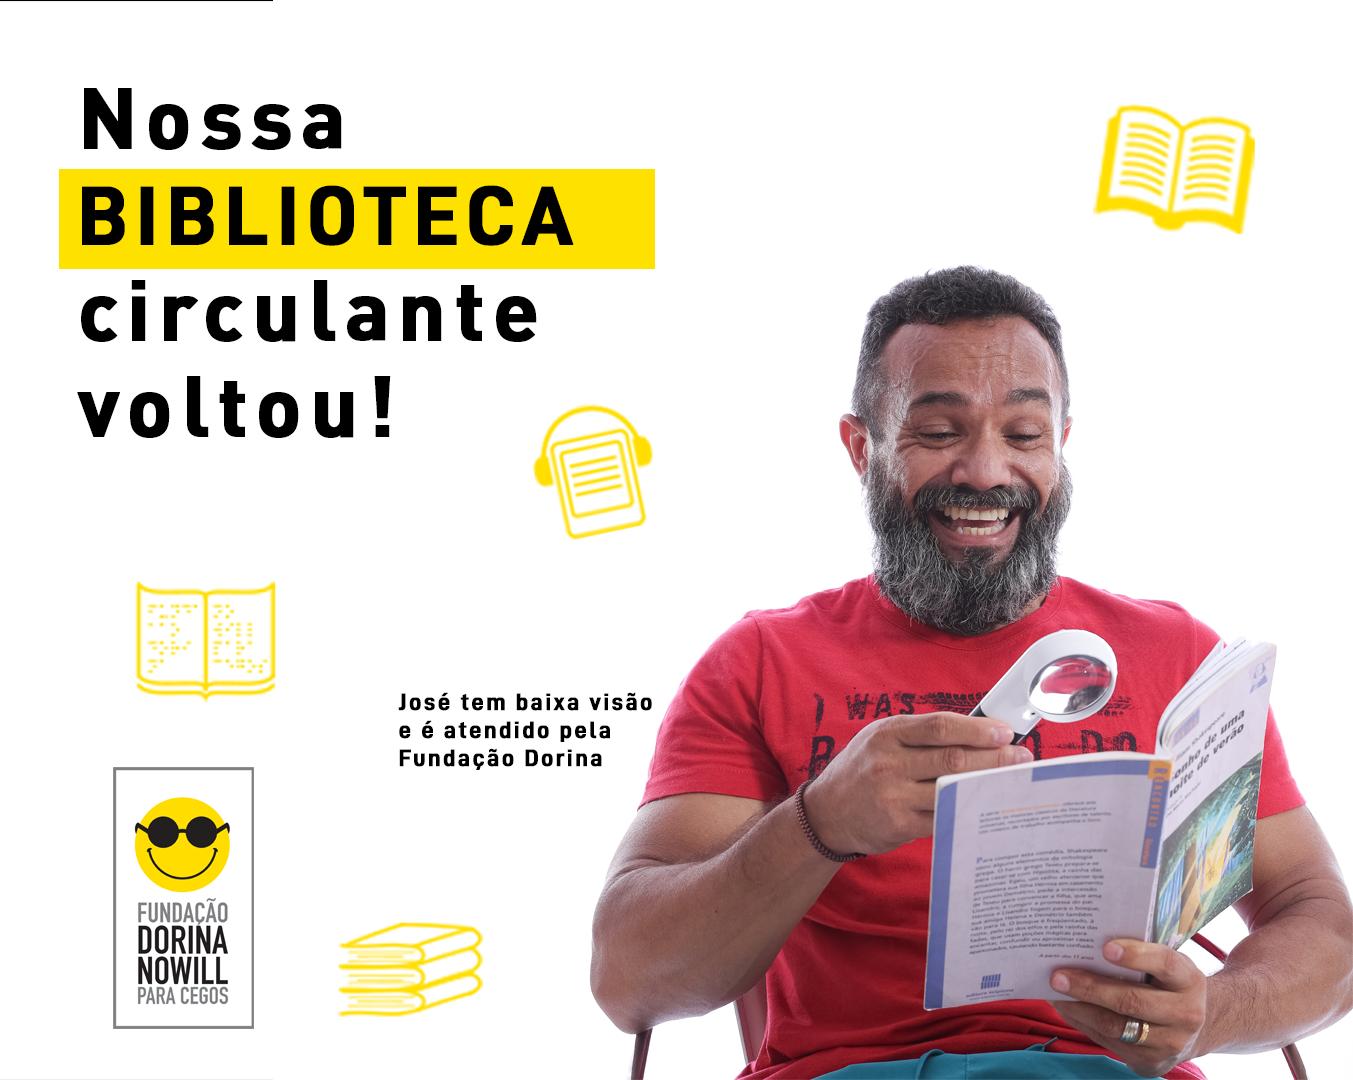 Biblioteca Circulante